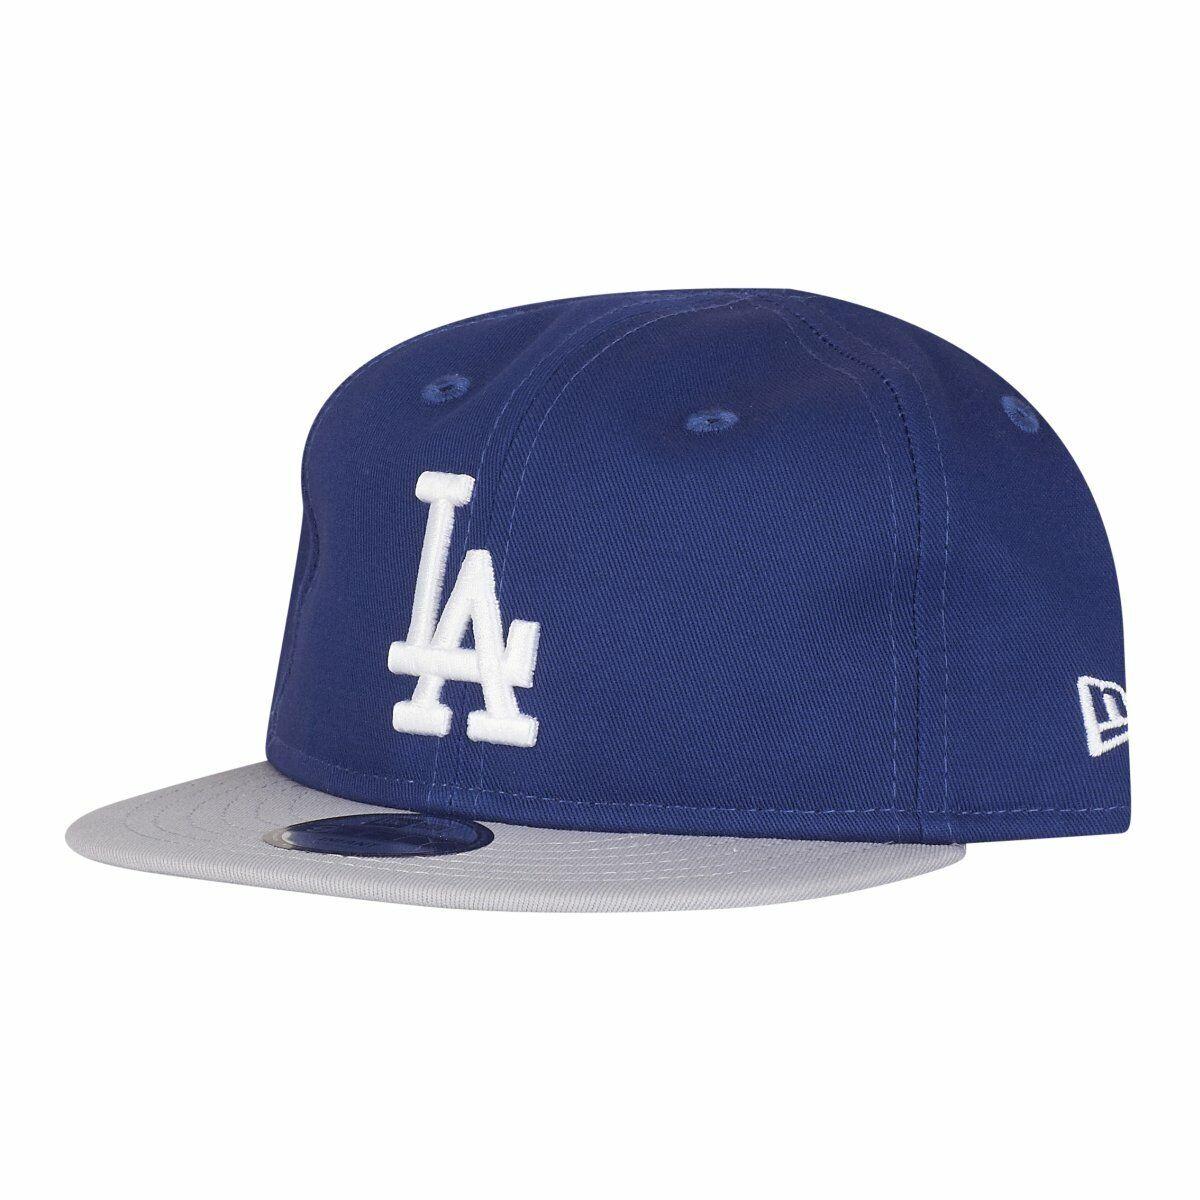 Era 9fifty los Angeles Dodgers Infant Snapback Caps Babys Young Children